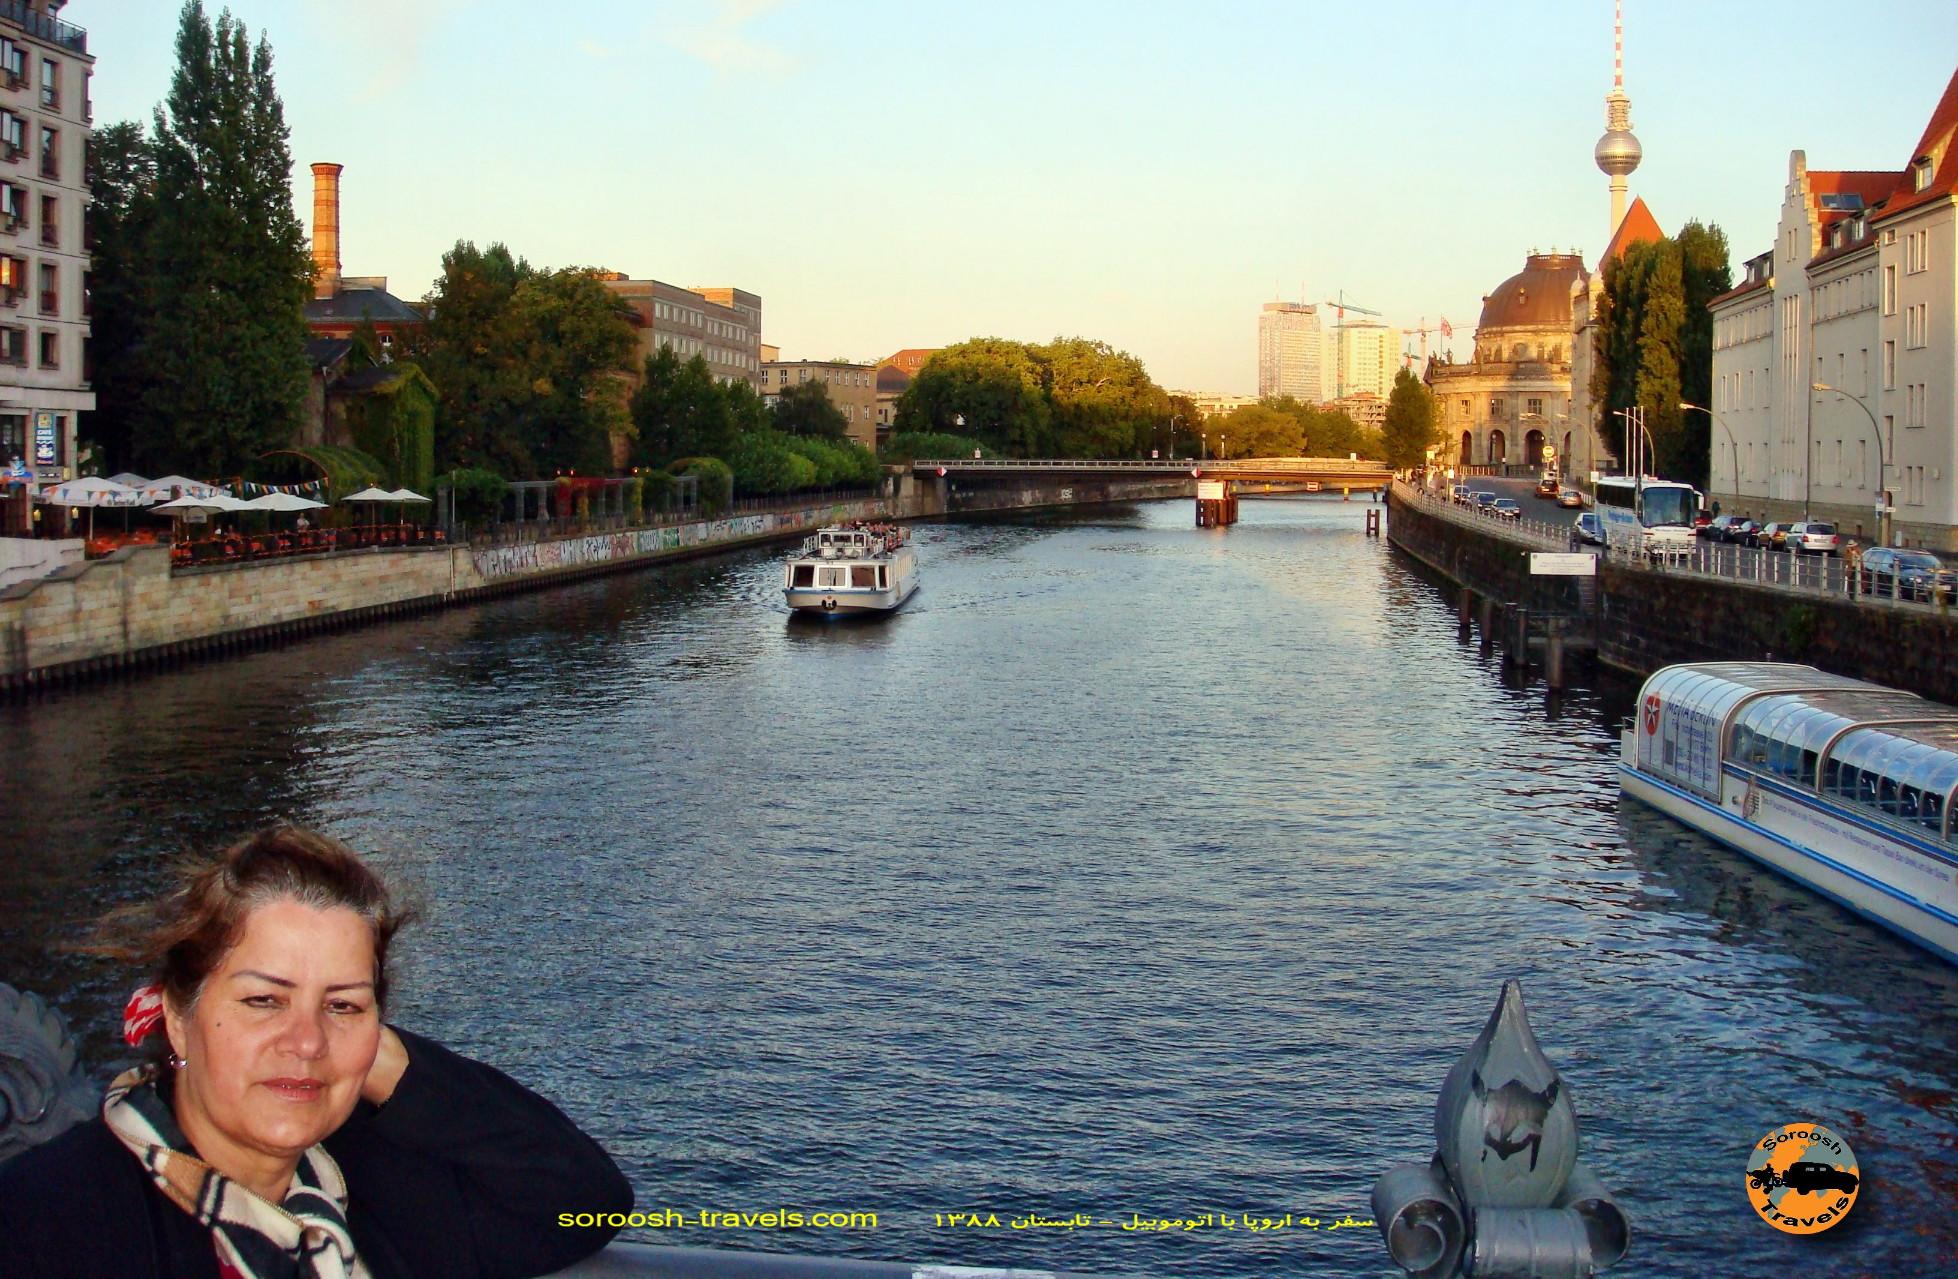 47-27-shahrivar-18-september-hamburg-to-berlin-9